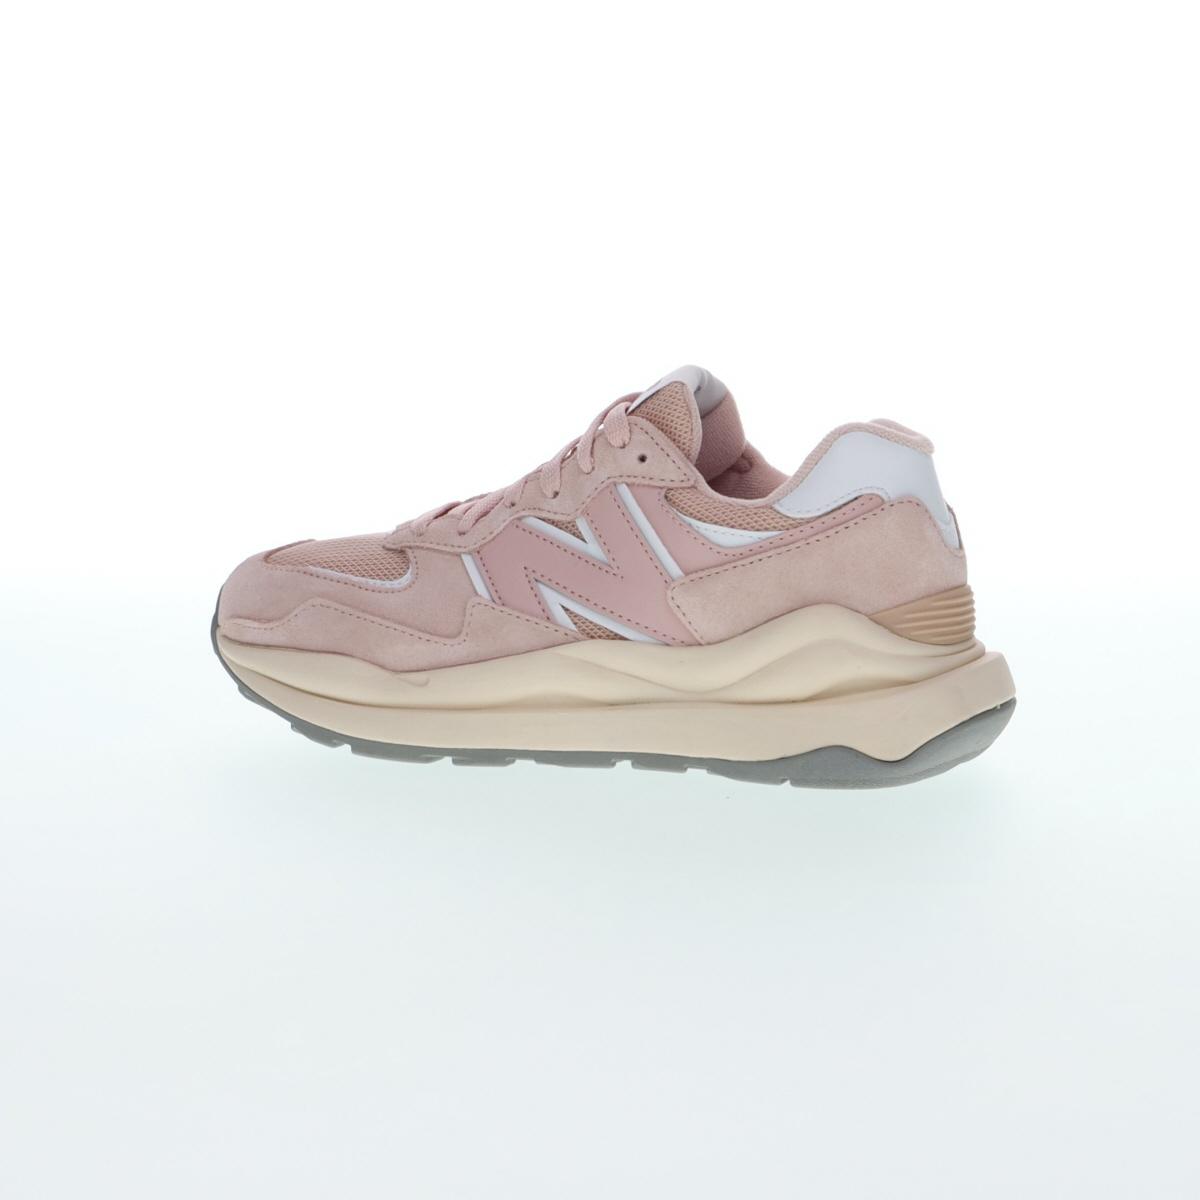 adidas ultra boost cg3039 women shoes sale sandals